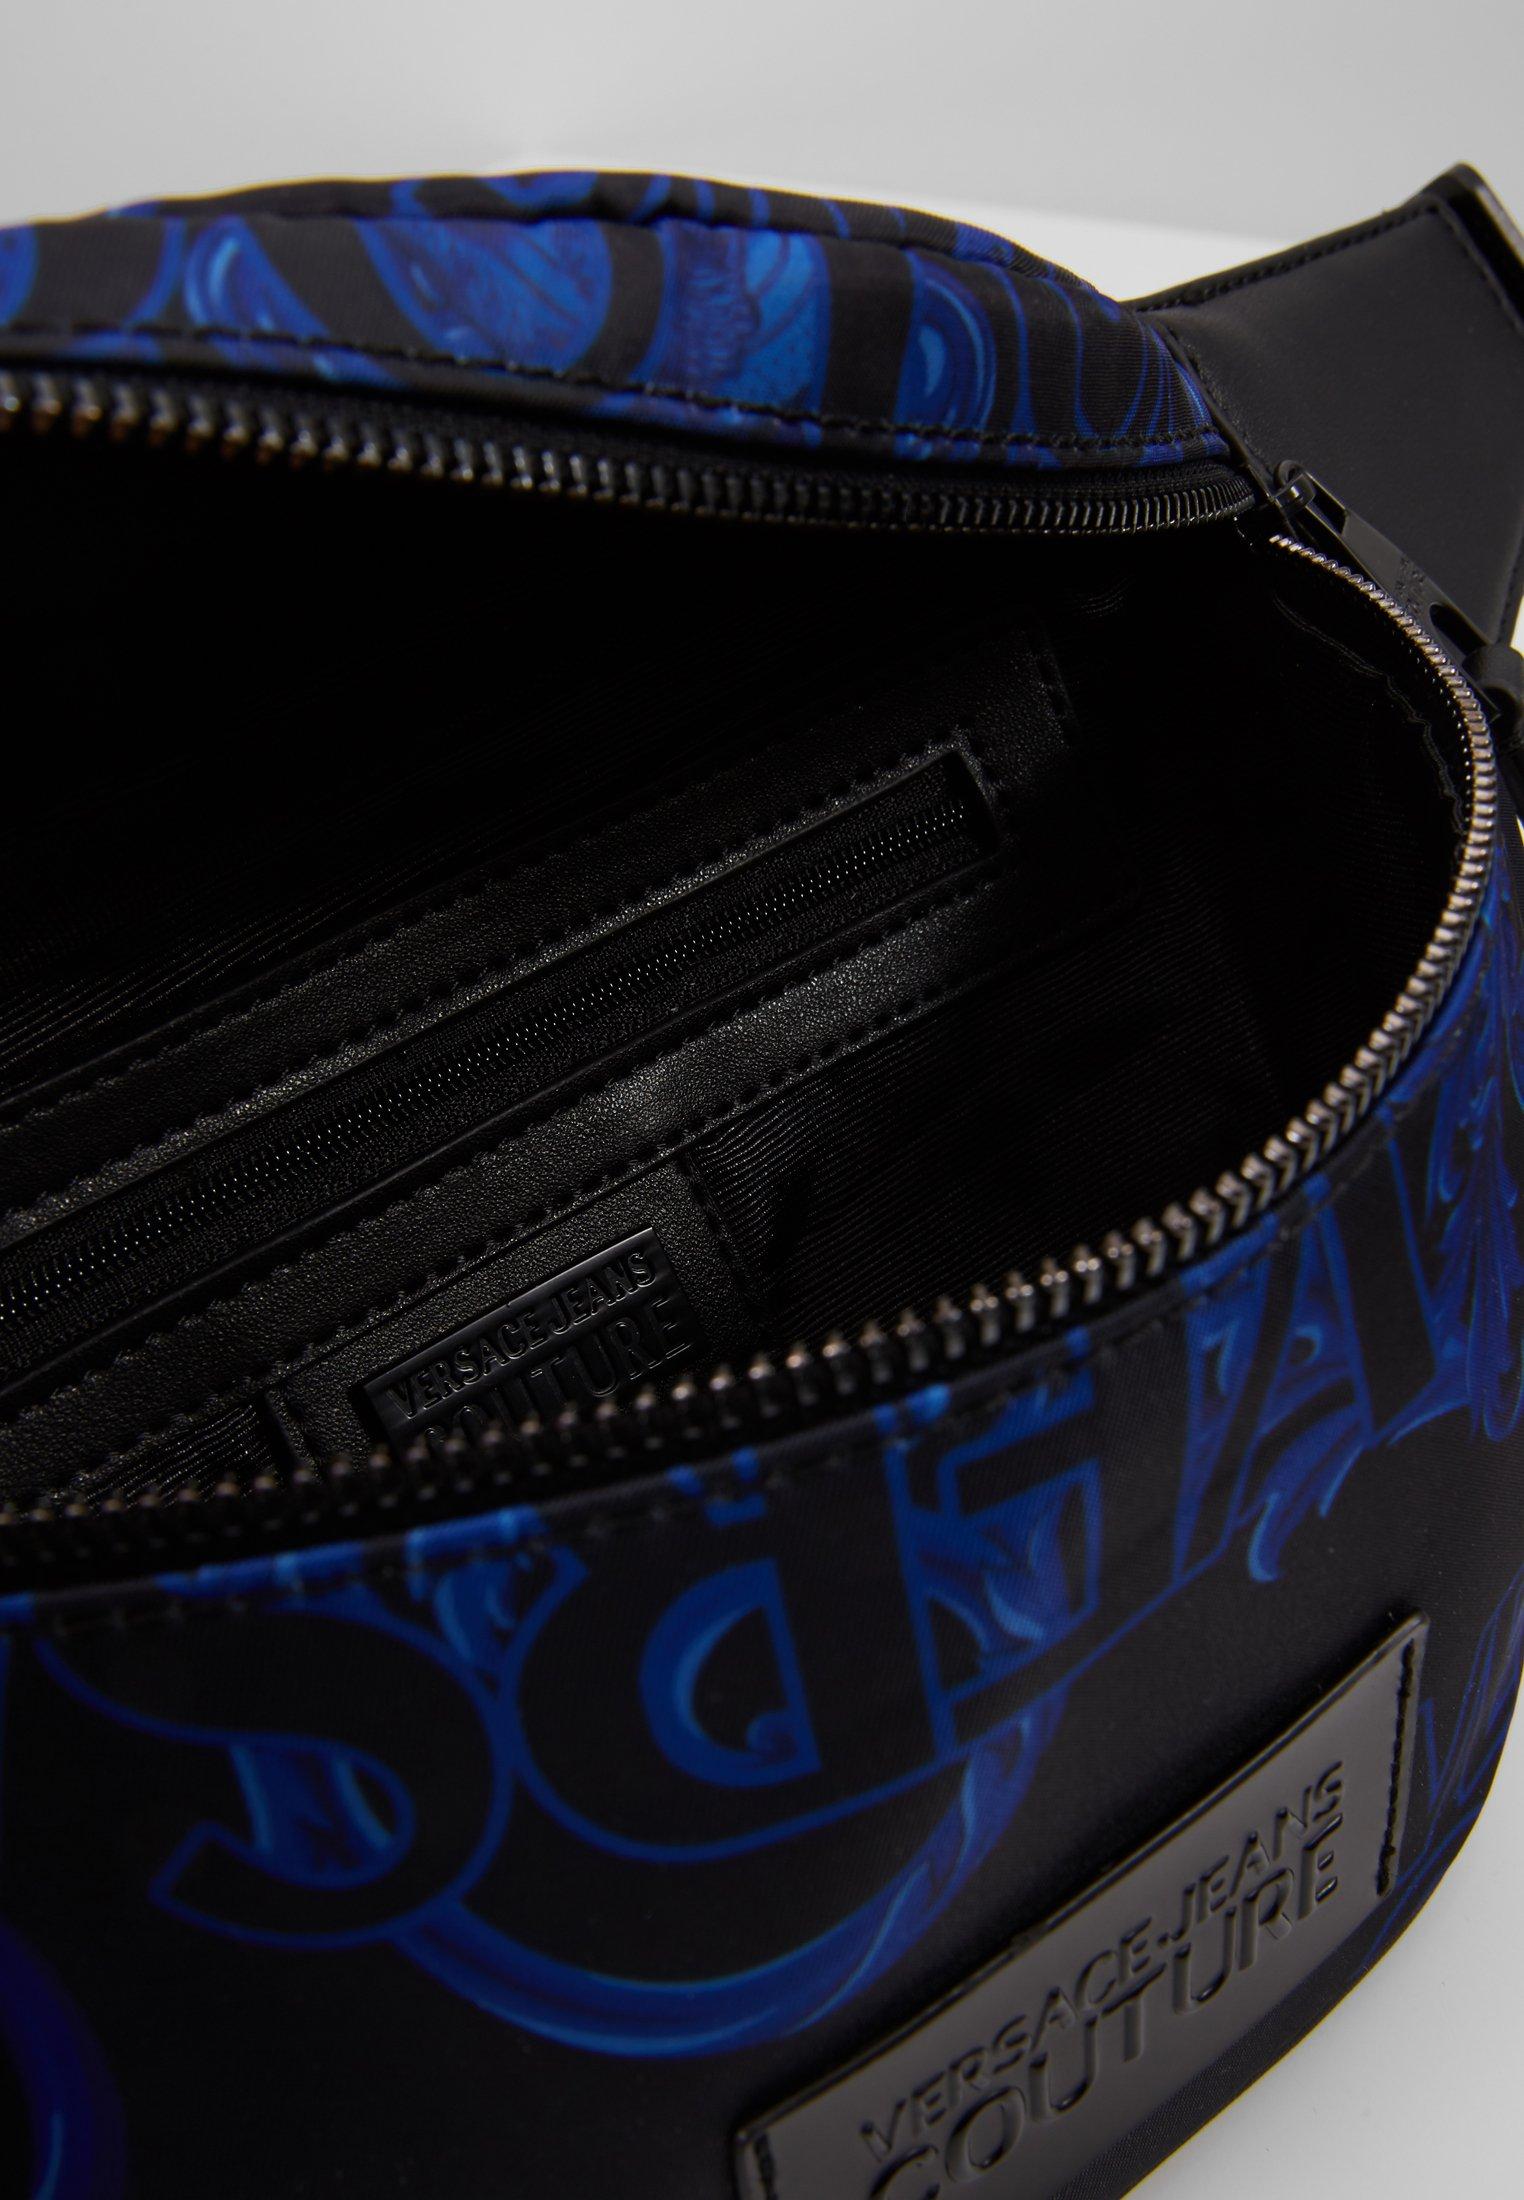 Jeans Blue BaroqueMarsupio Versace Logo Couture Linea doWxBEQrCe